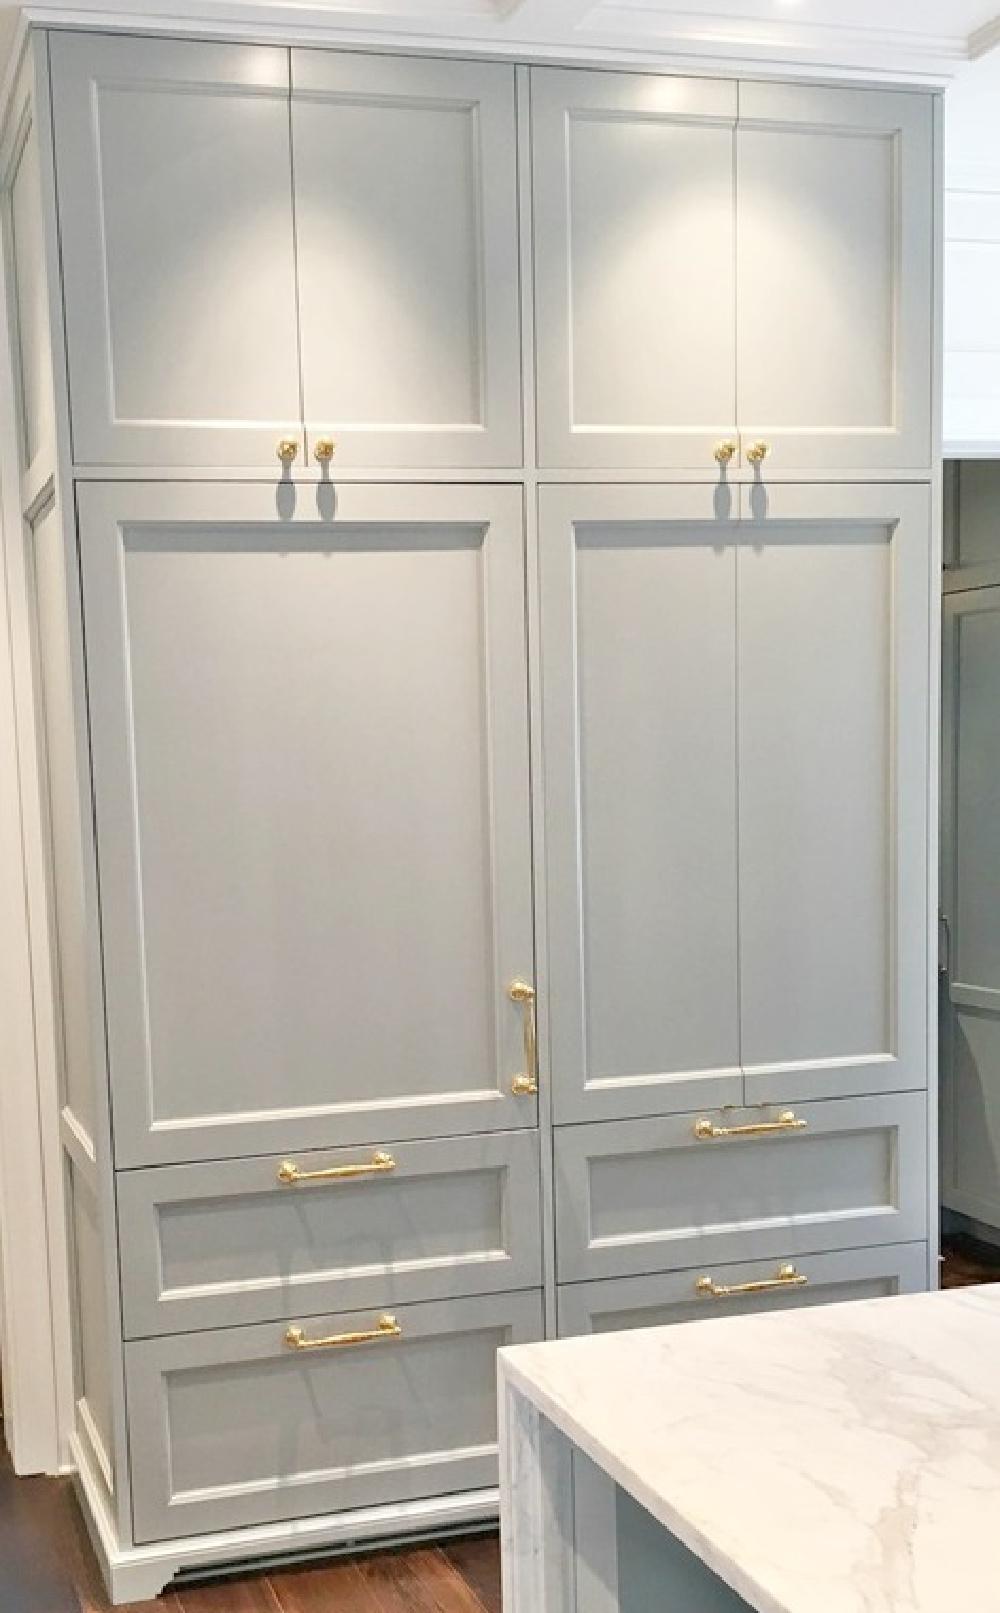 Custom cabinetry in a designer showhouse kitchen is painted Farrow & Ball Light Blue and is enhanced by brass hardware. #bluekitchen #farrowandballlightblue #timelesskitchen #kitchendesign #traditionalkitchen